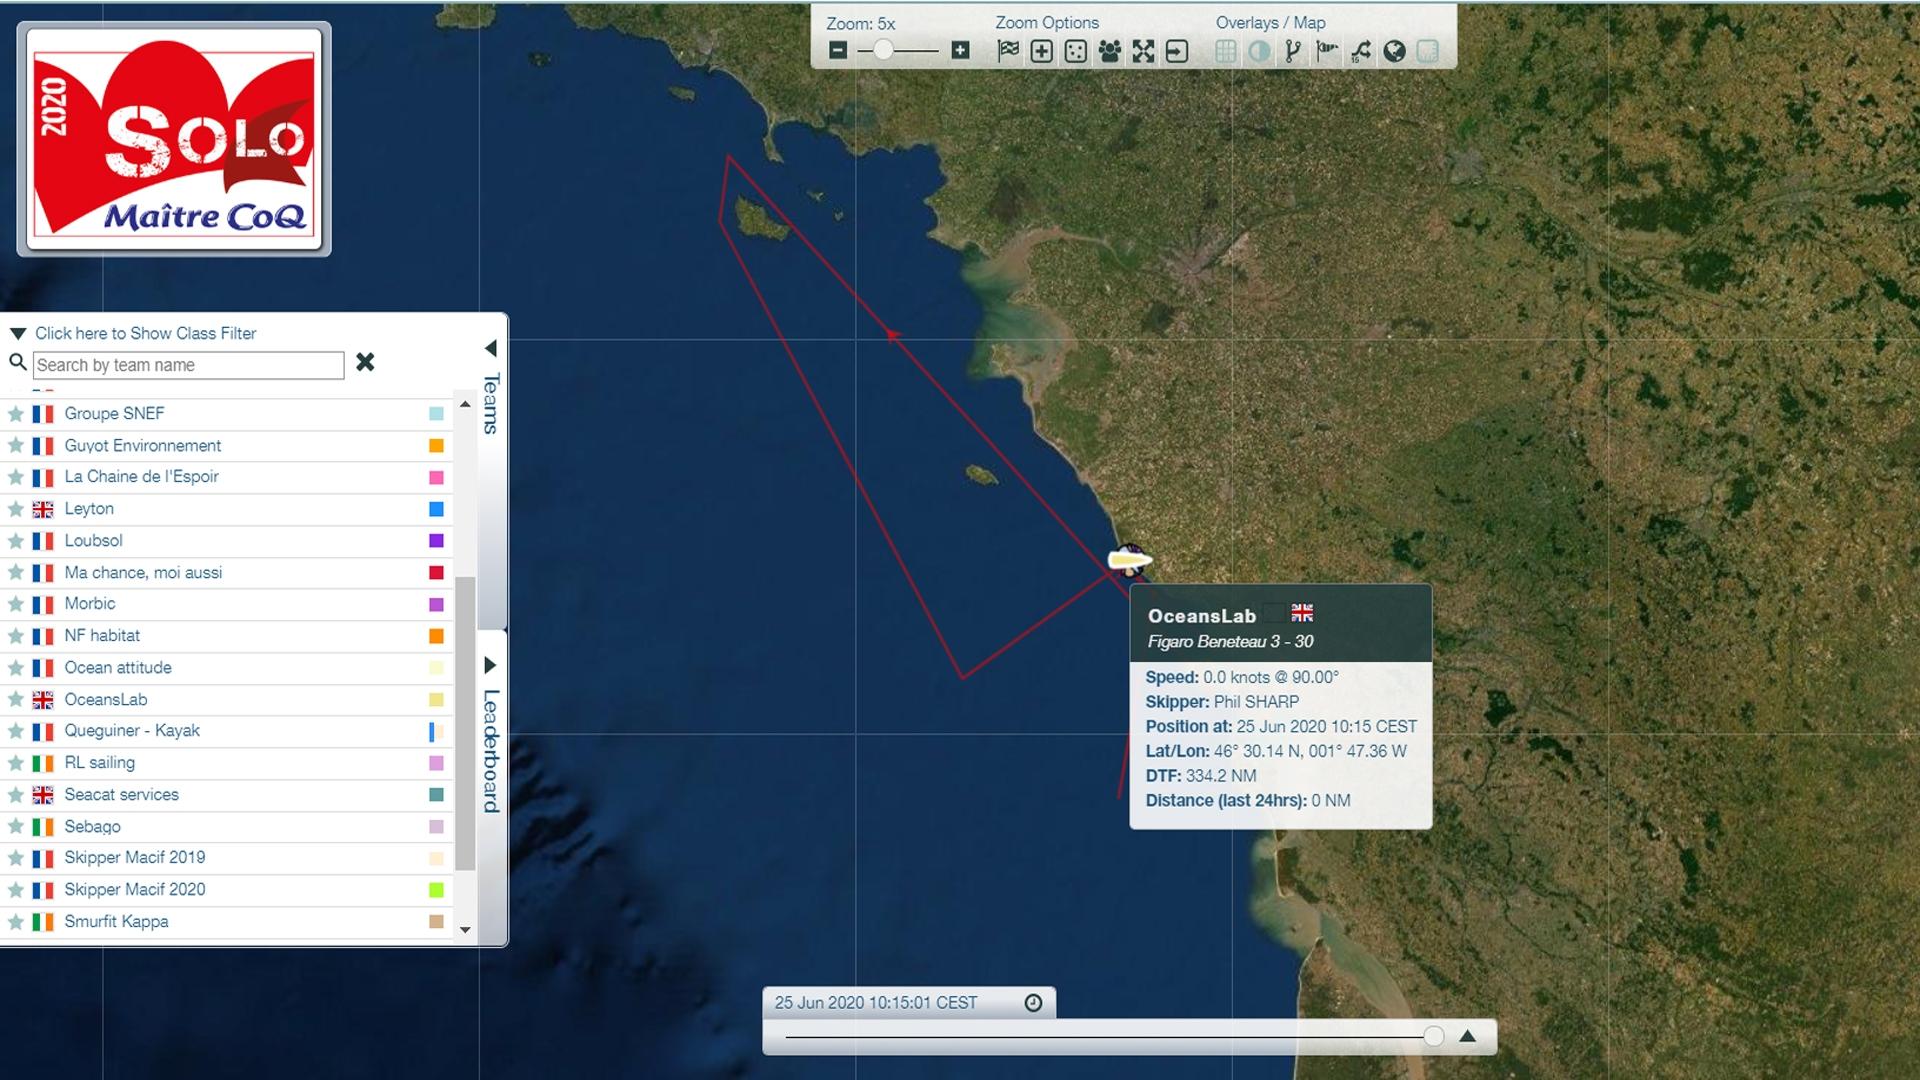 How to follow_SMC tracker_OceansLab